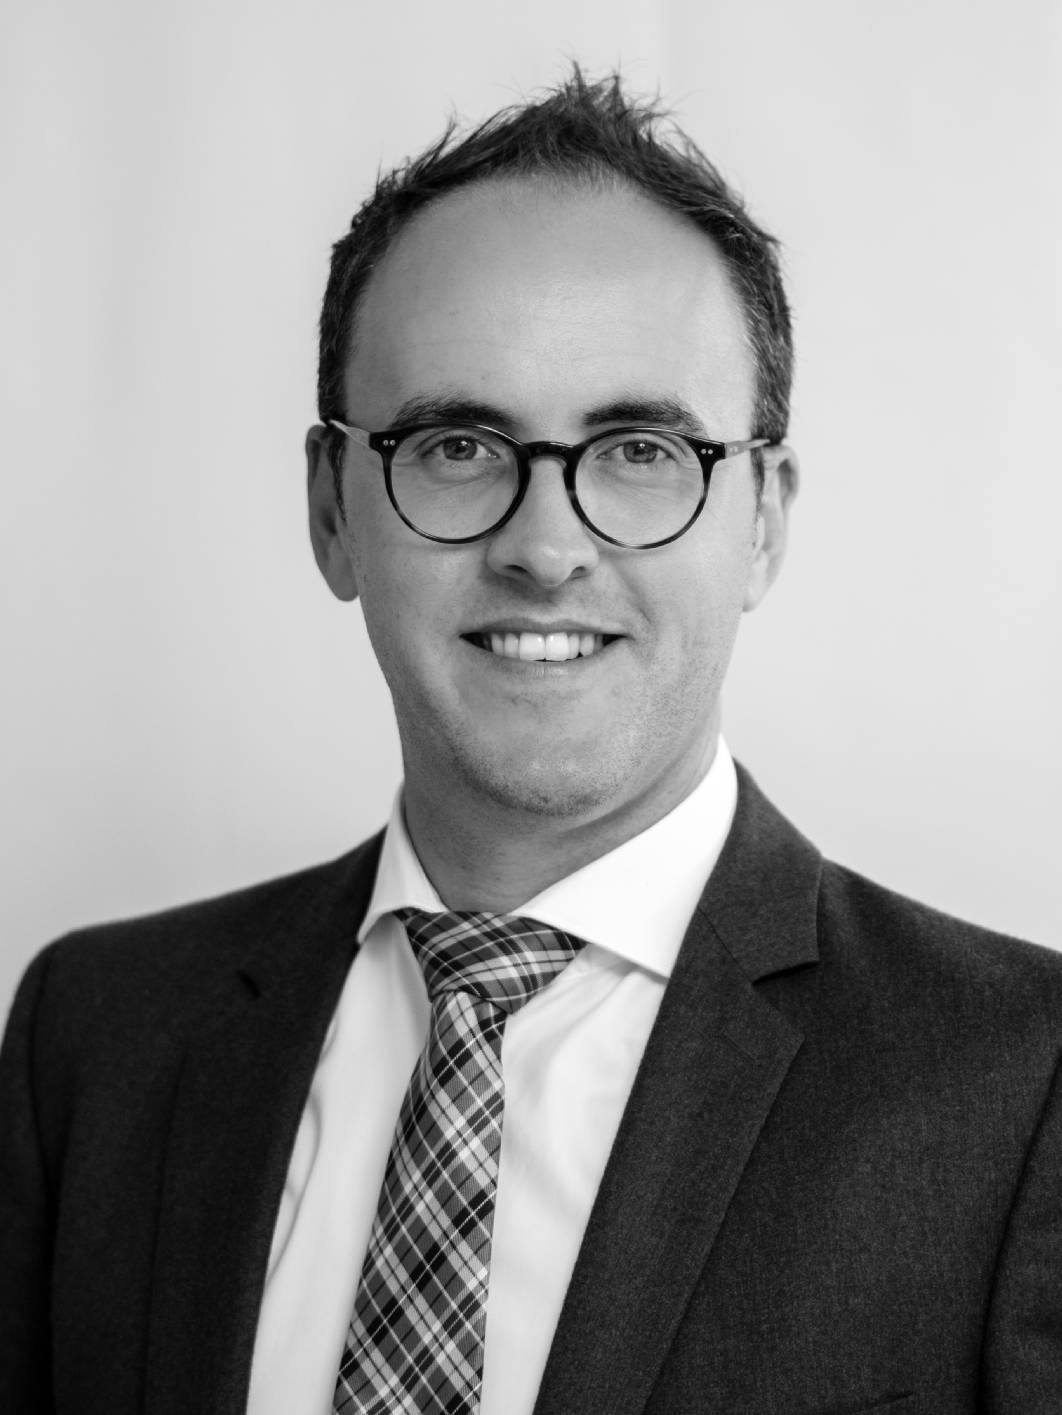 Rpo Rechtsanwälte In Köln Patrick Klinkhammer Llm